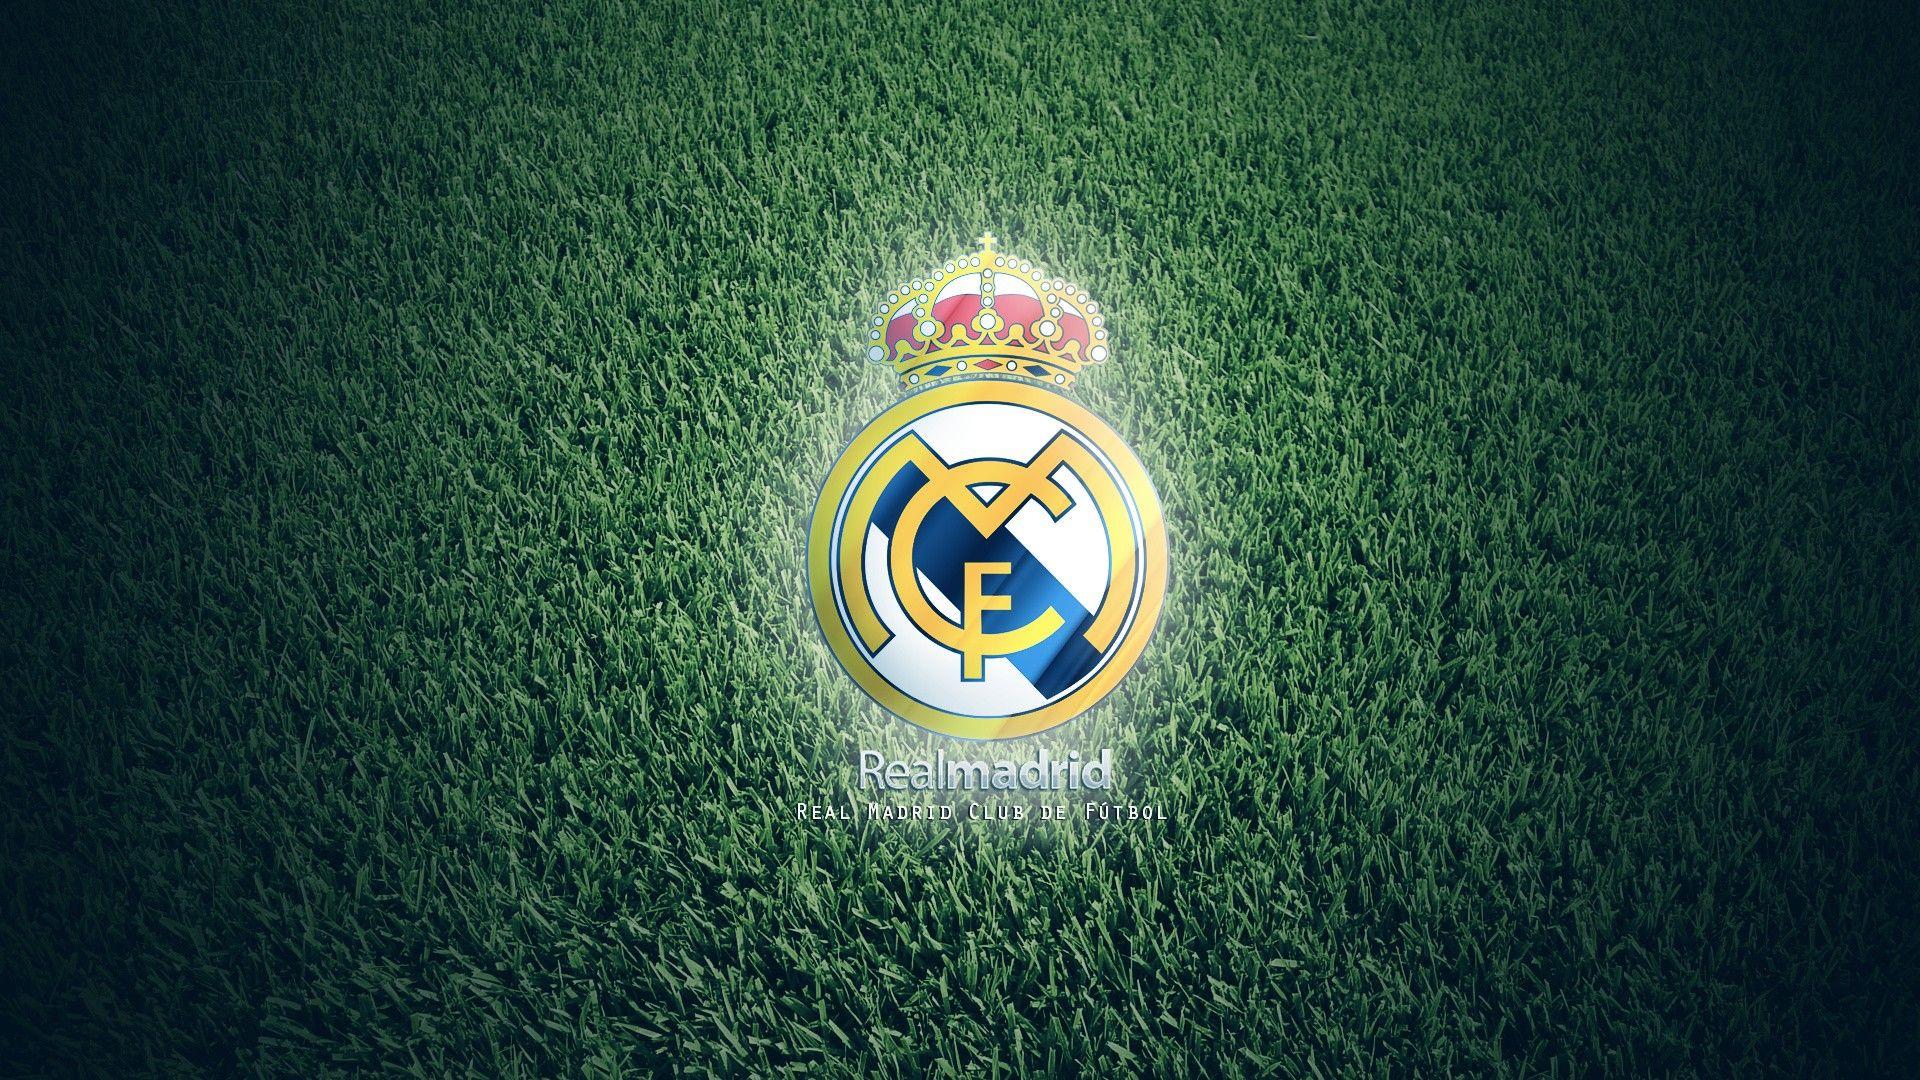 Real Madrid Logo 3d Wallpapers Hd Desktop Real Madrid Logo Wallpapers Real Madrid Wallpapers Real Madrid Logo